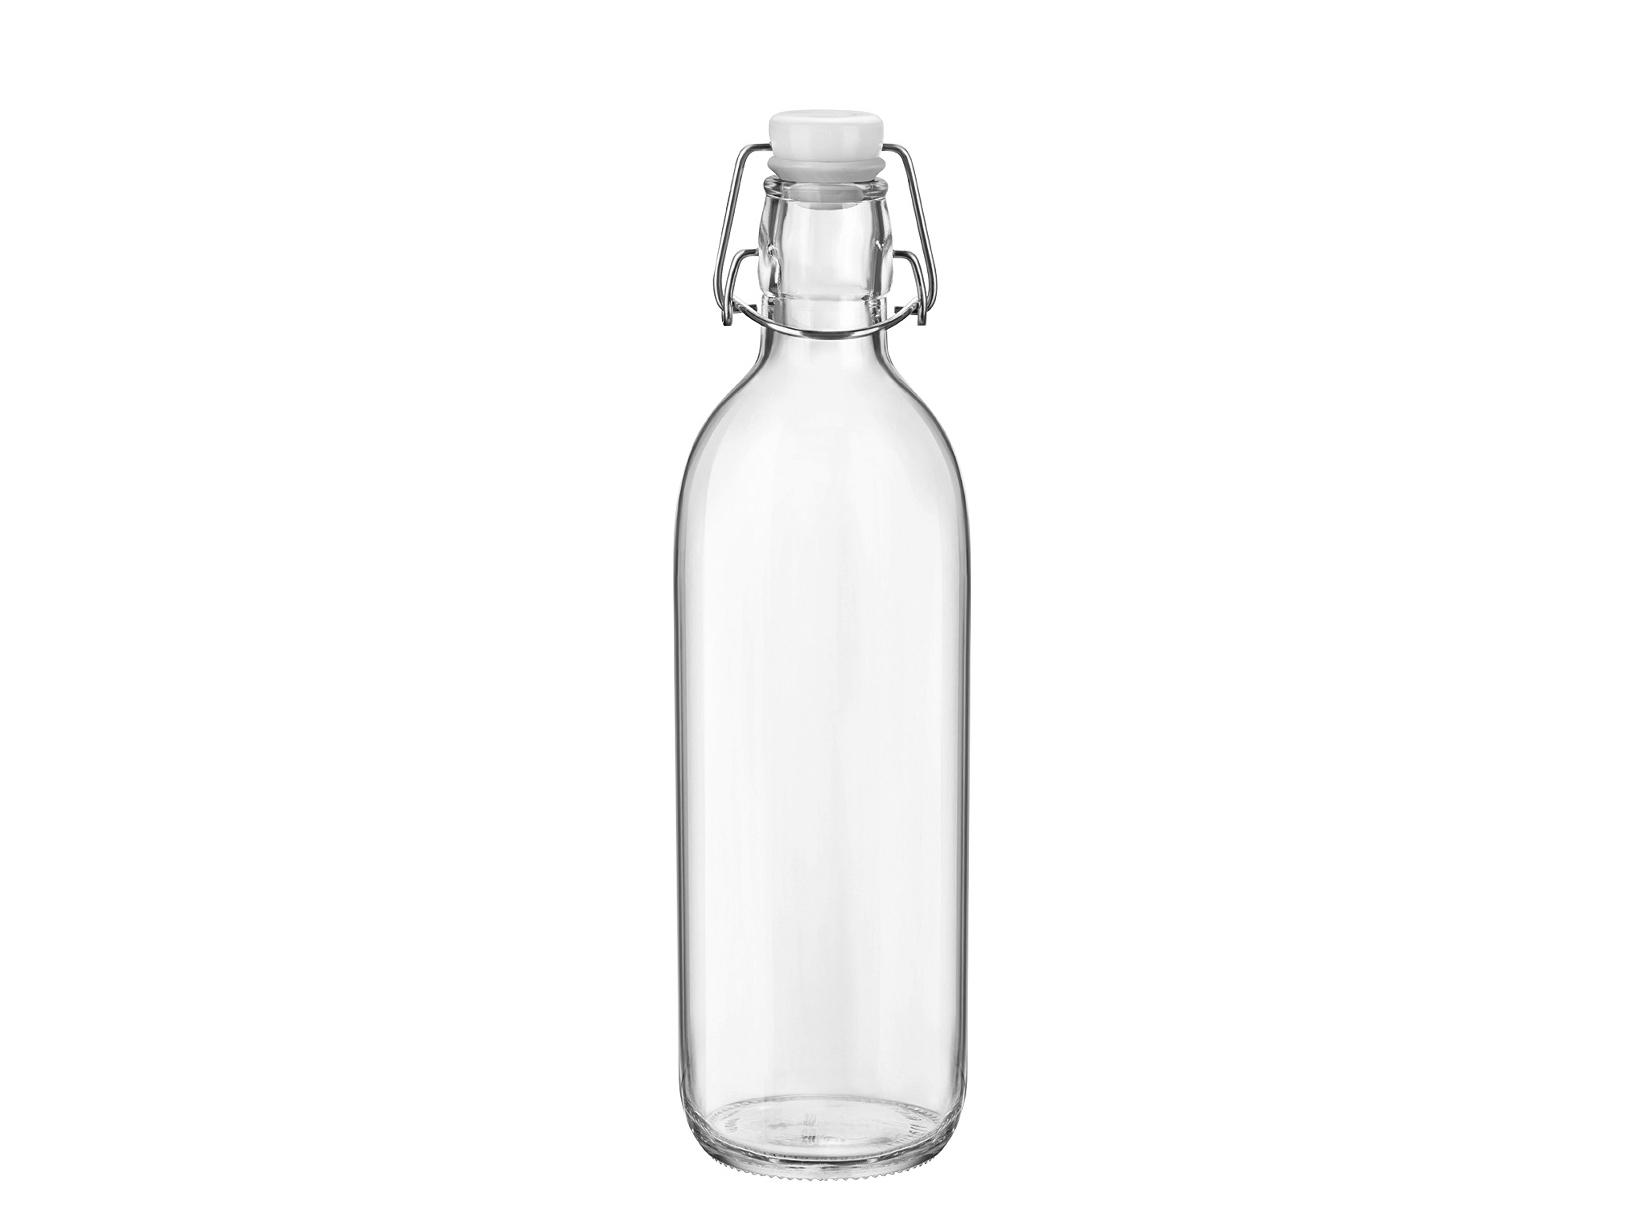 Acquista Set 6 Bottiglia Vetro Emilia 1 17505309 | Glooke.com